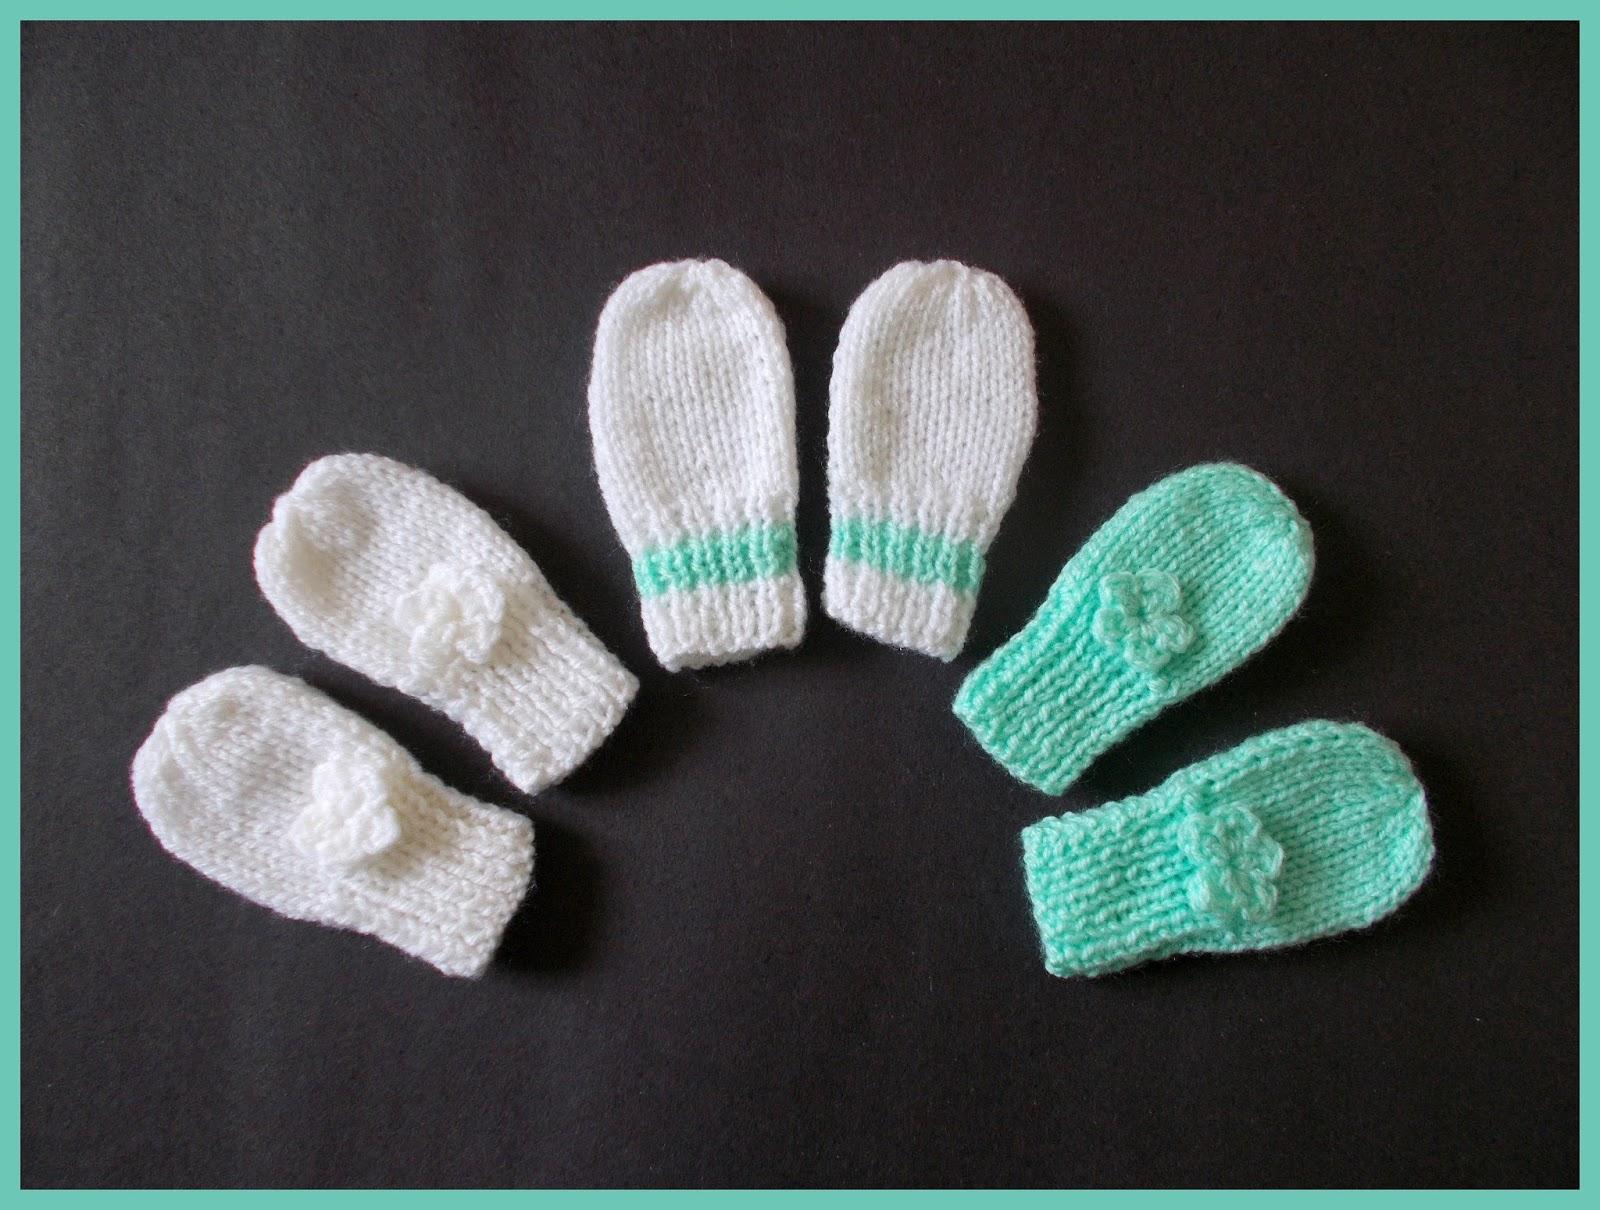 Marianna\'s Lazy Daisy Days: Simple Baby and Preemie Baby Mittens